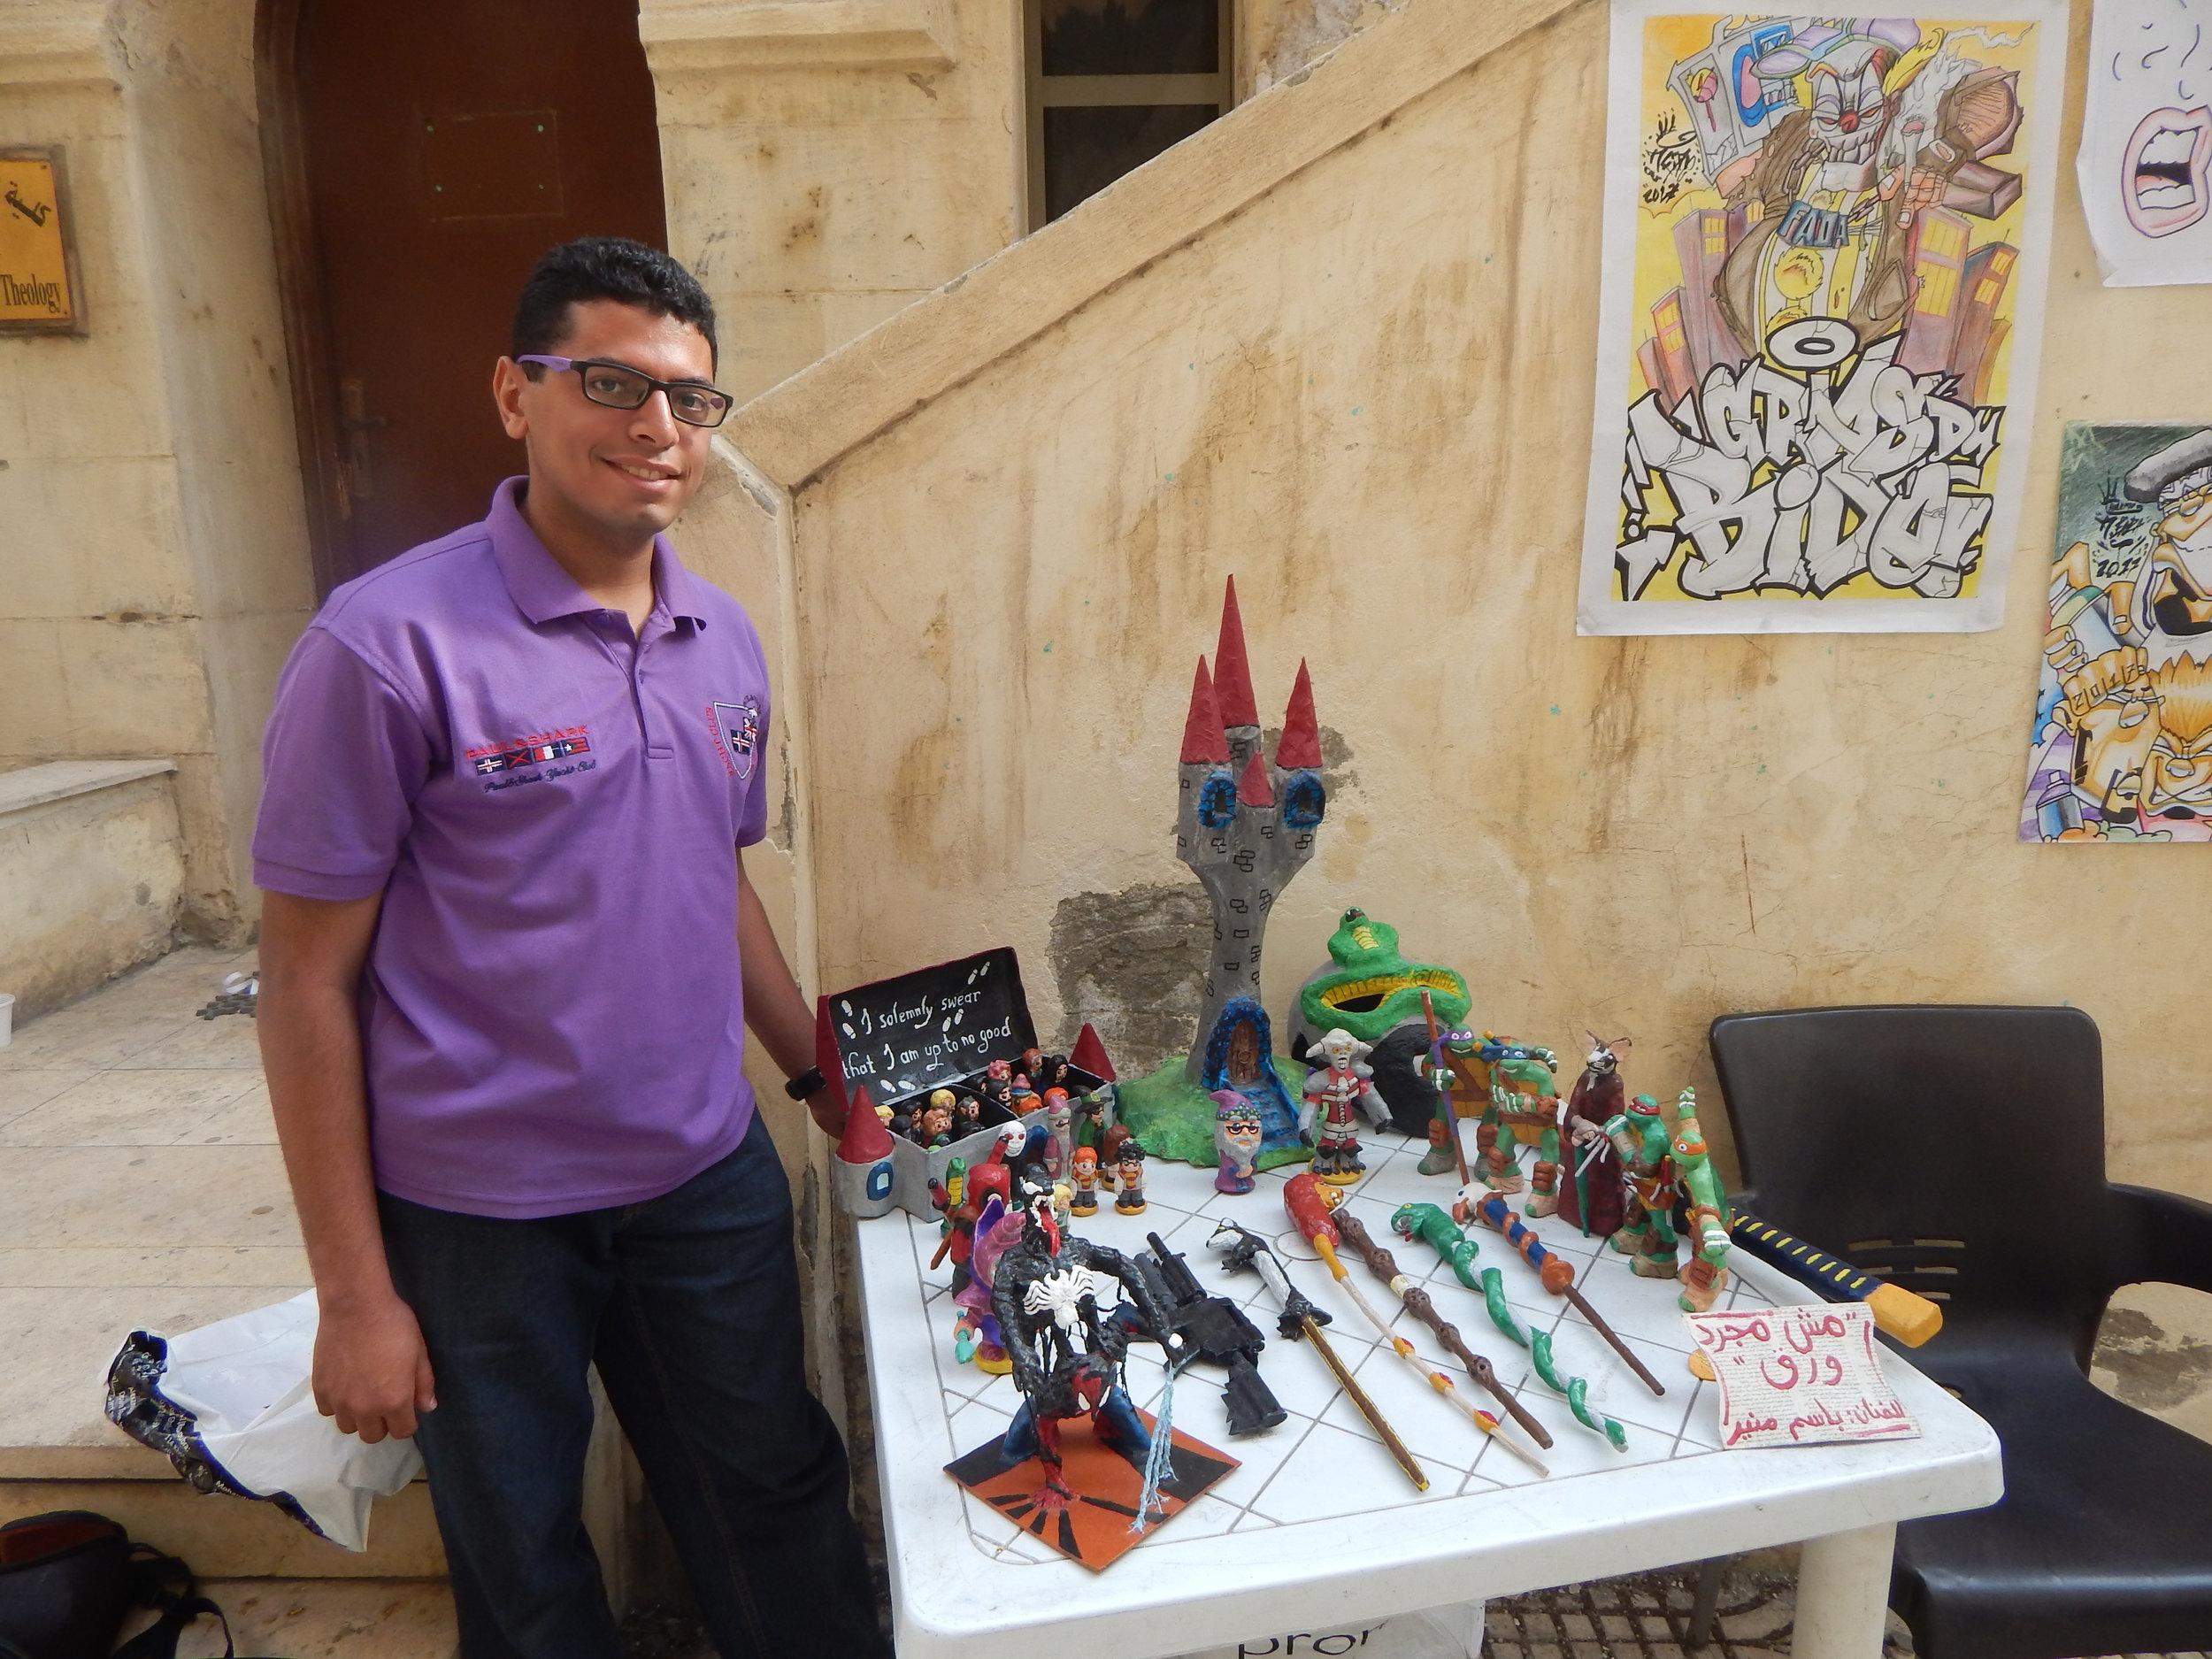 Bassem Mounir with his art display. [Photo by Jayson Casper.]